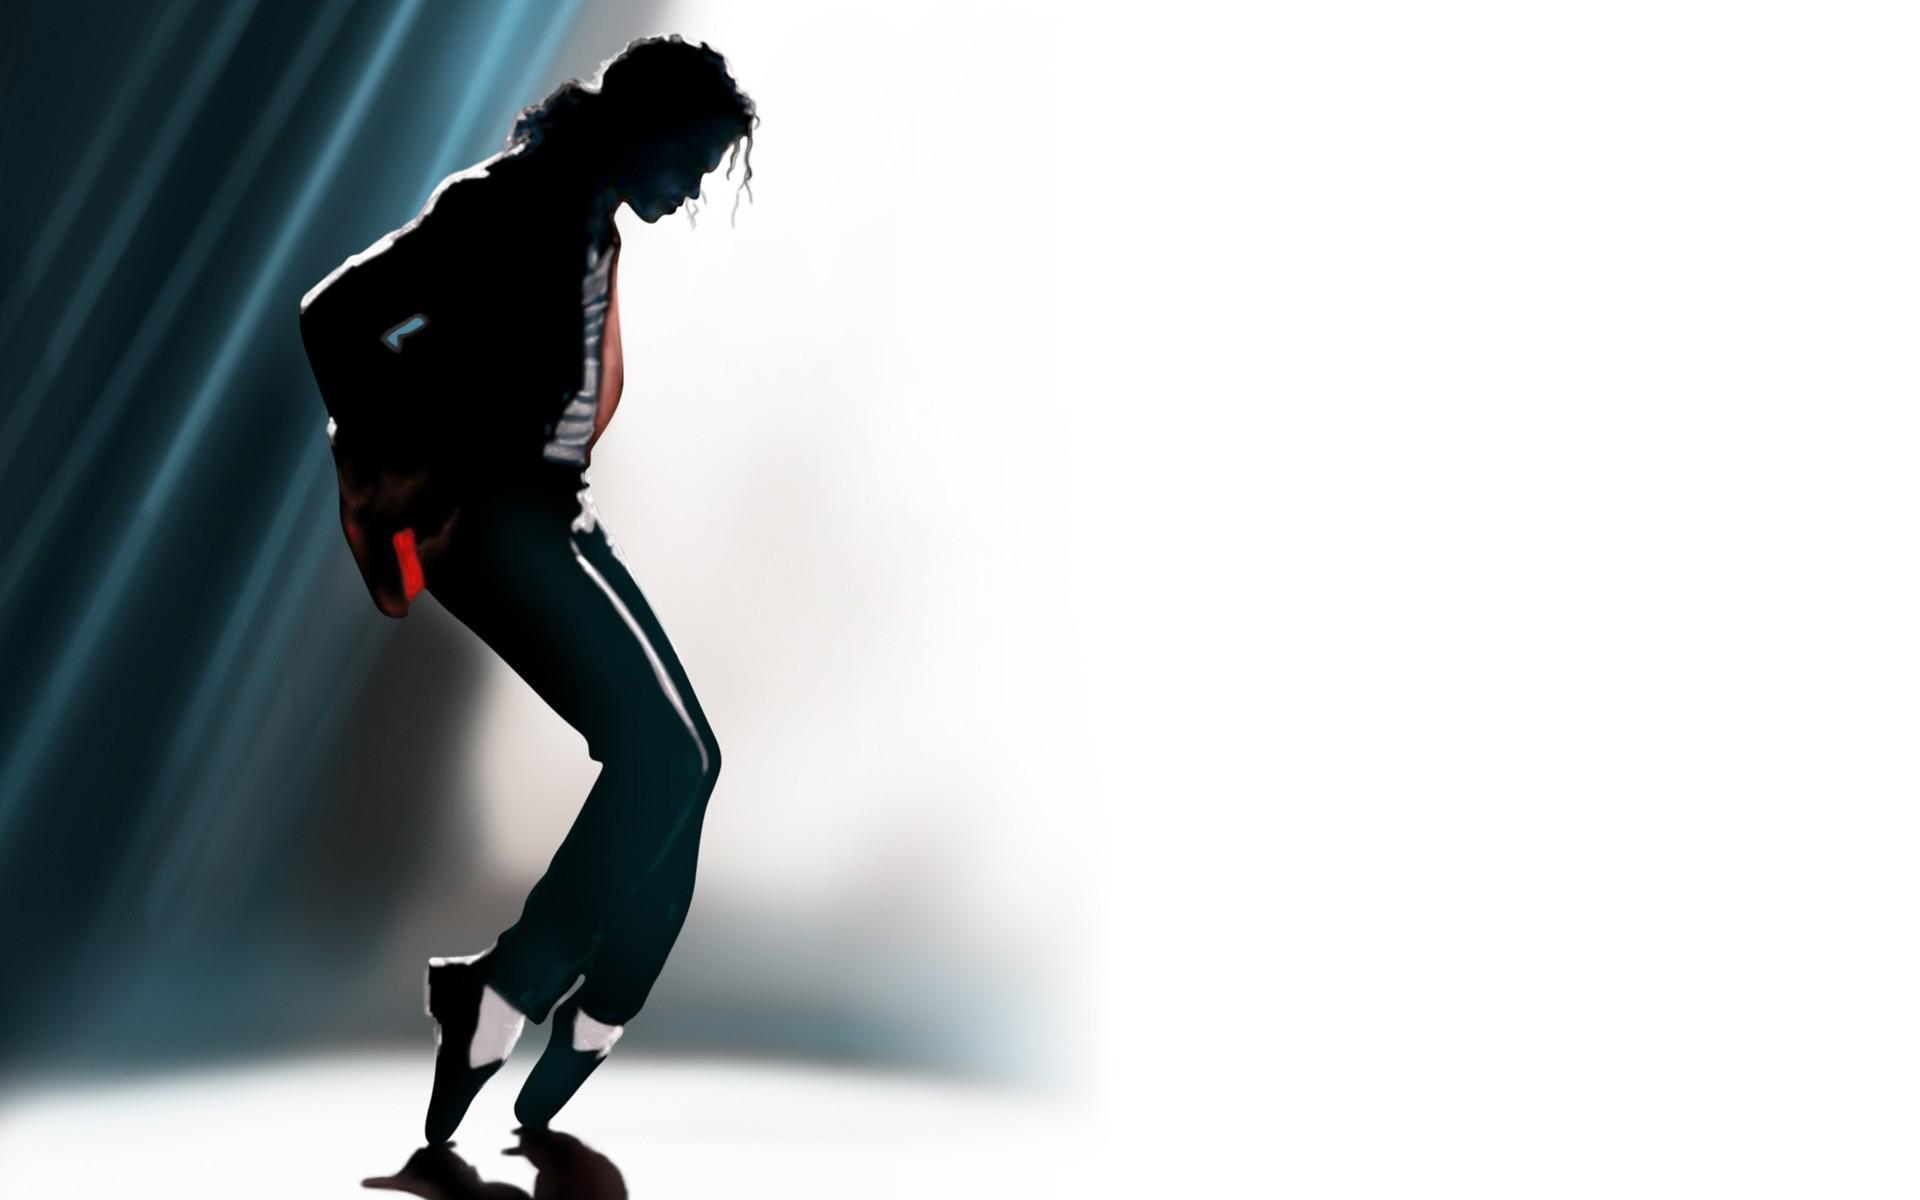 Fall Hd Wallpapers For Mac Michael Jackson Backgrounds Pixelstalk Net